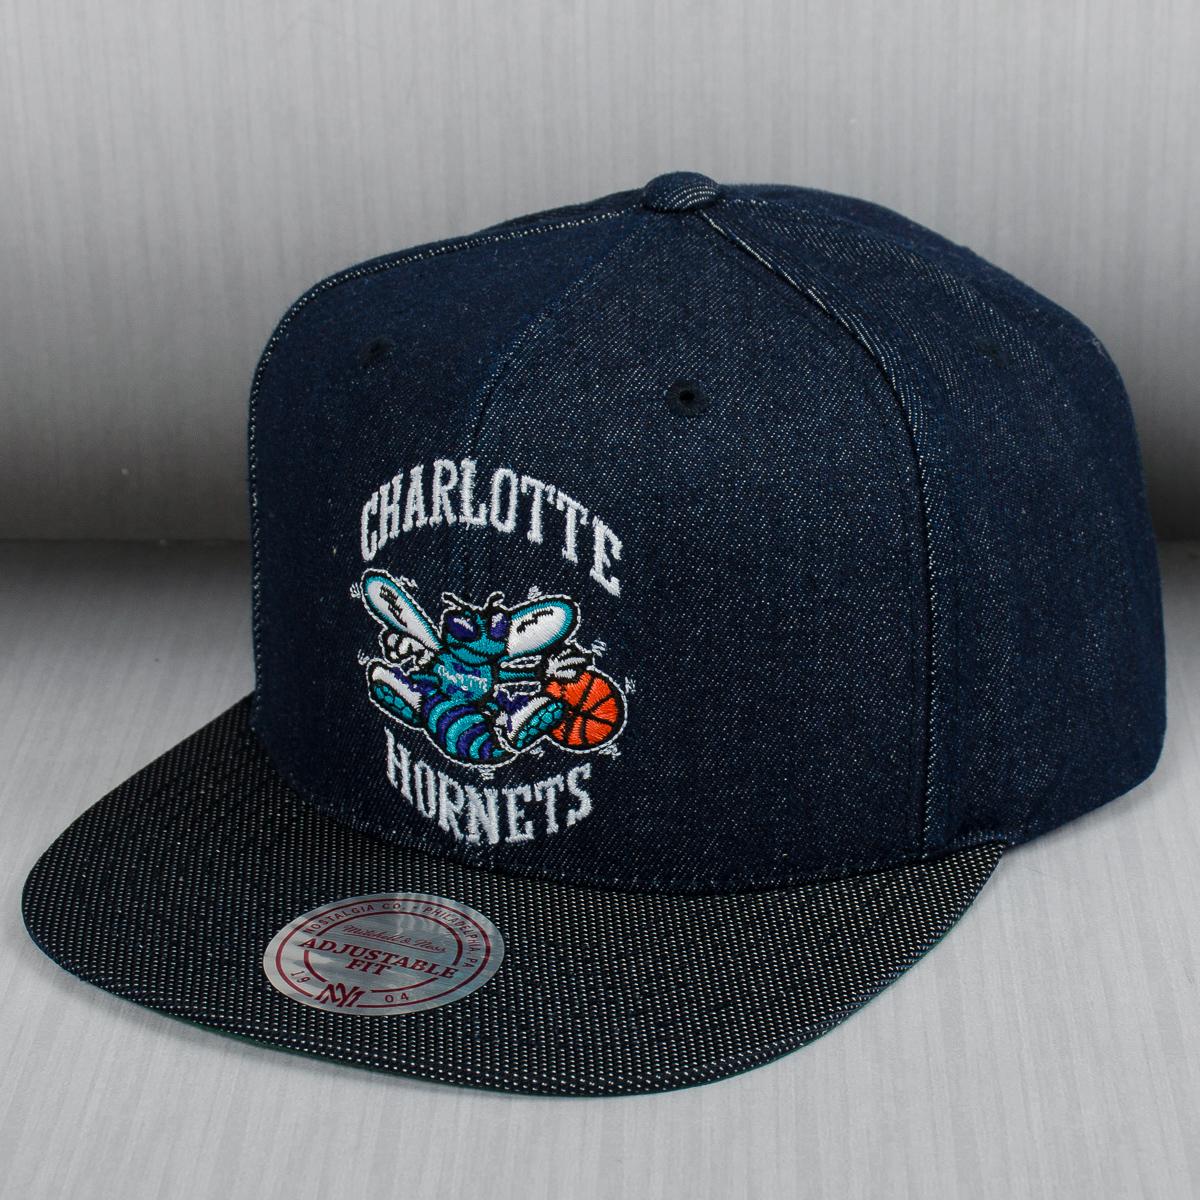 sale retailer 98b0a 53f84 Mitchell   Ness NBA Charlotte Hornets Raw Denim Snapback Cap